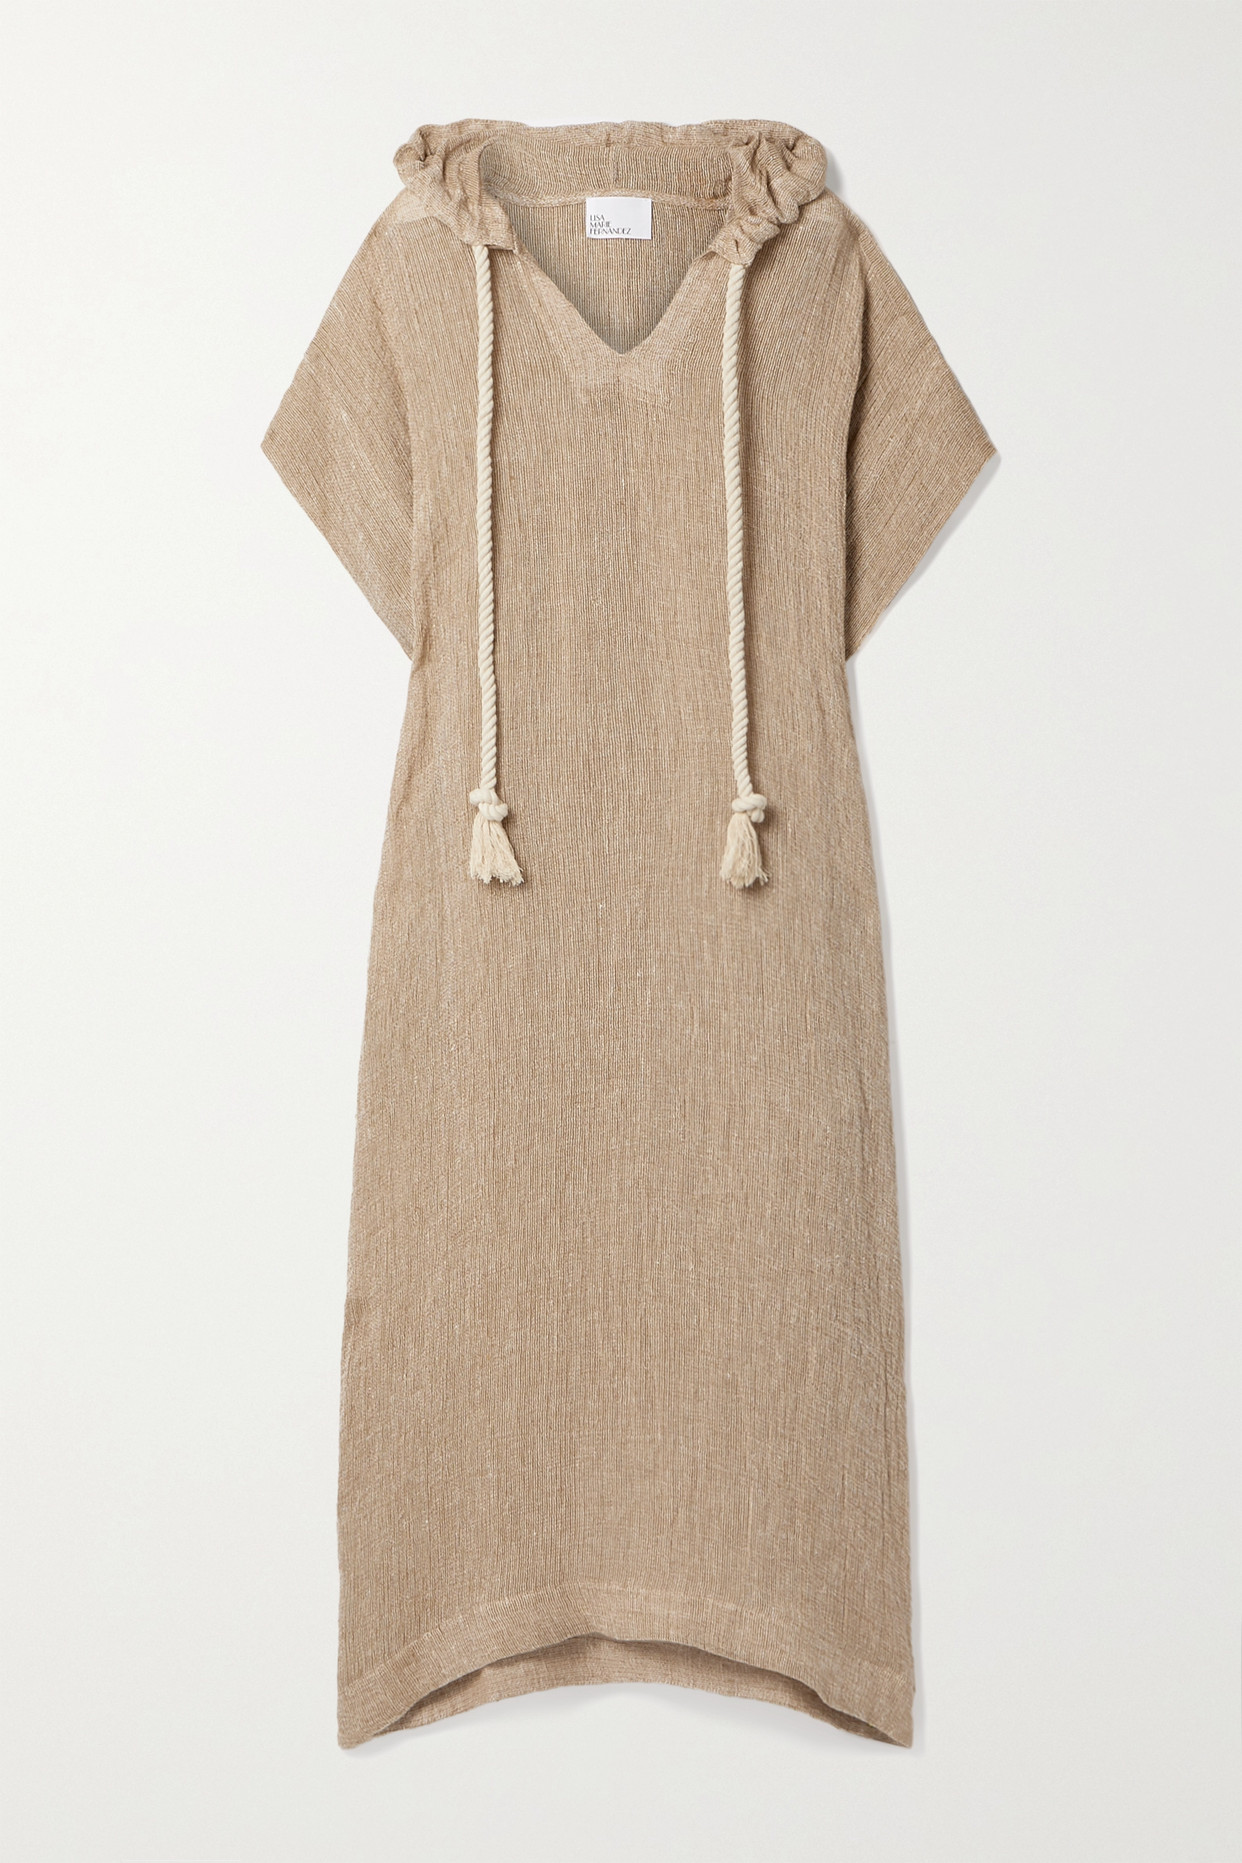 LISA MARIE FERNANDEZ - 【net Sustain】连帽亚麻混纺薄纱长罩衫裙 - 中性色 - 2